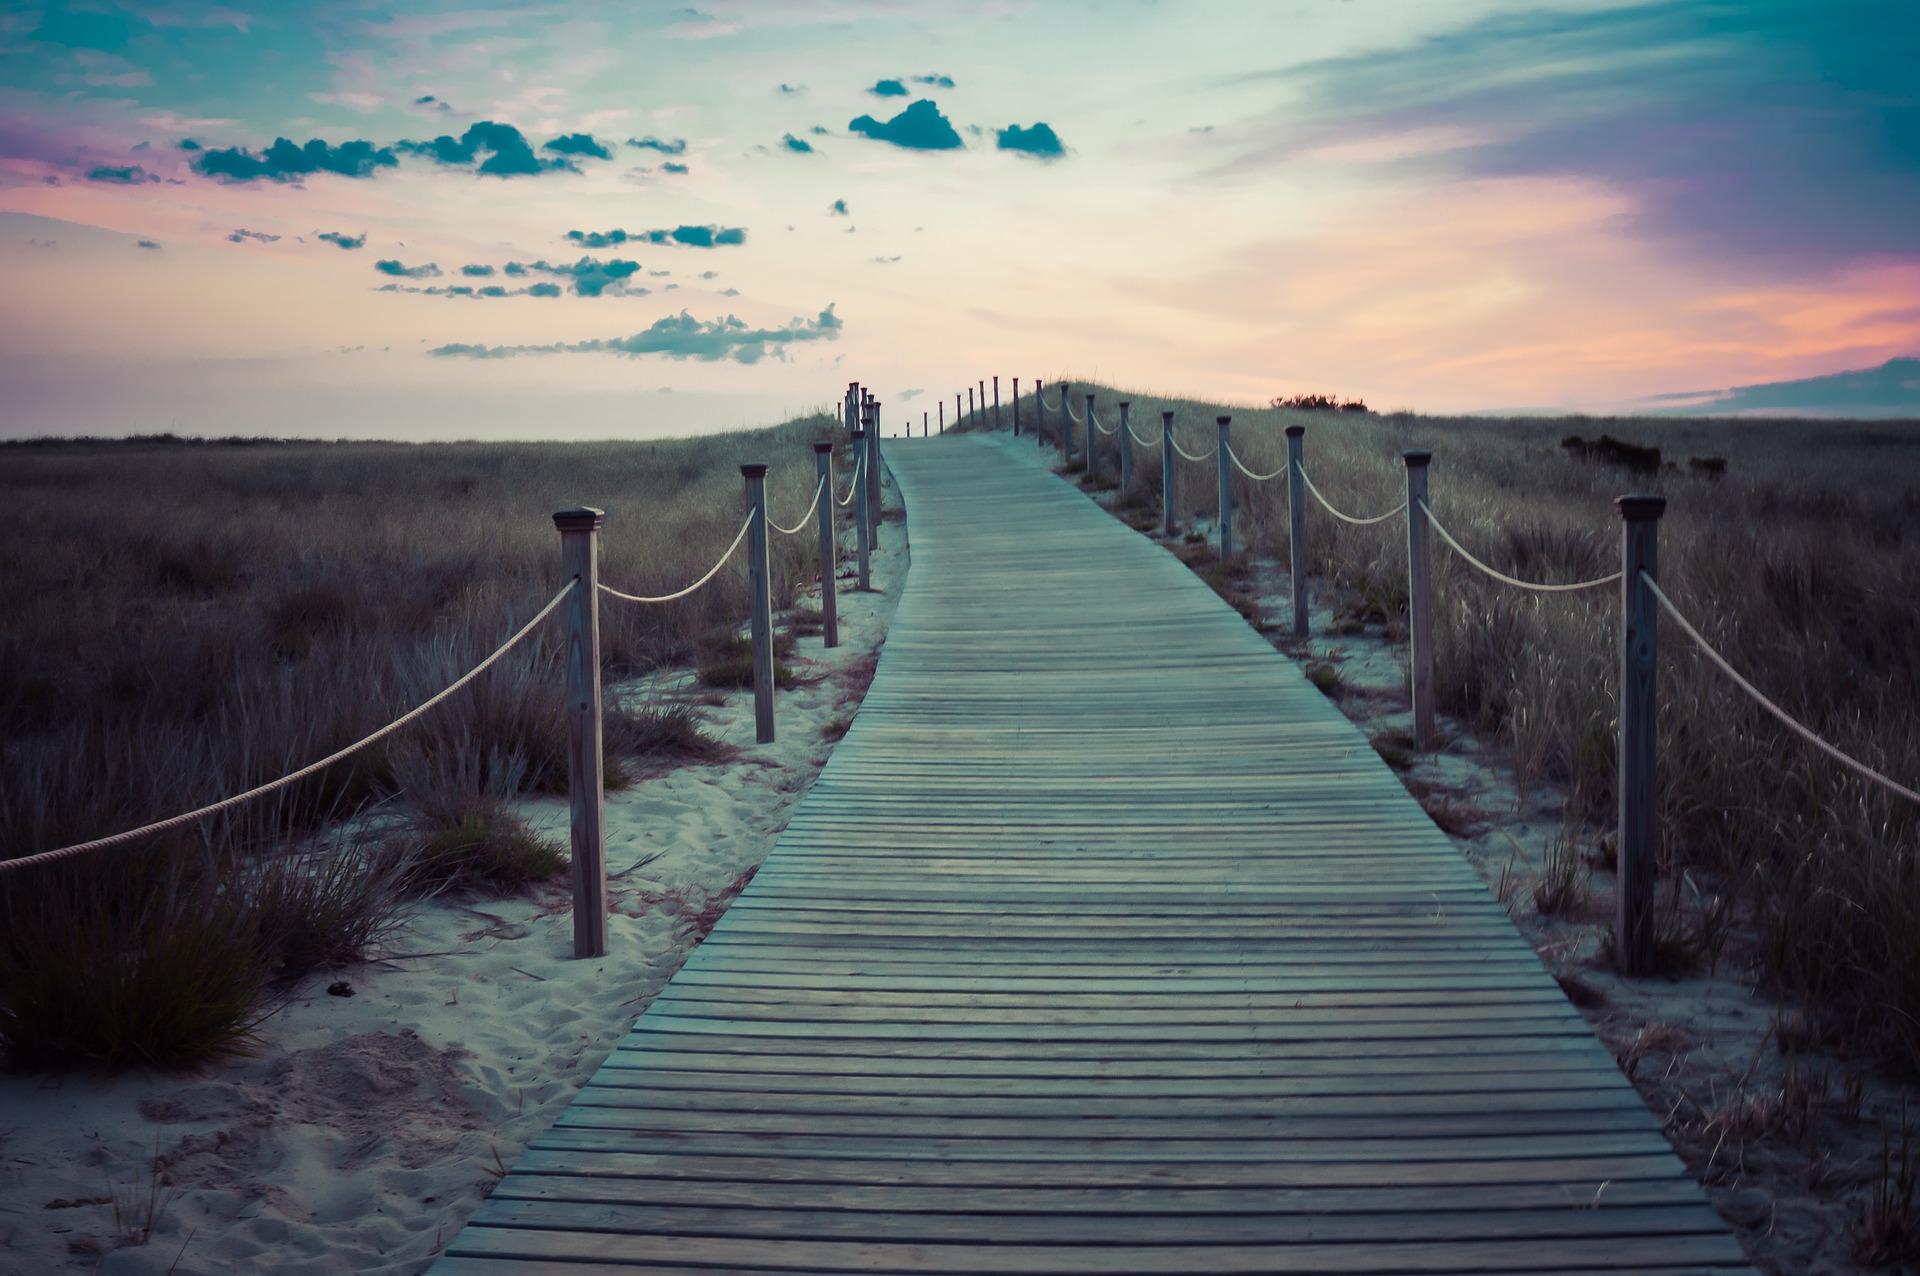 Bridge to the unknown…